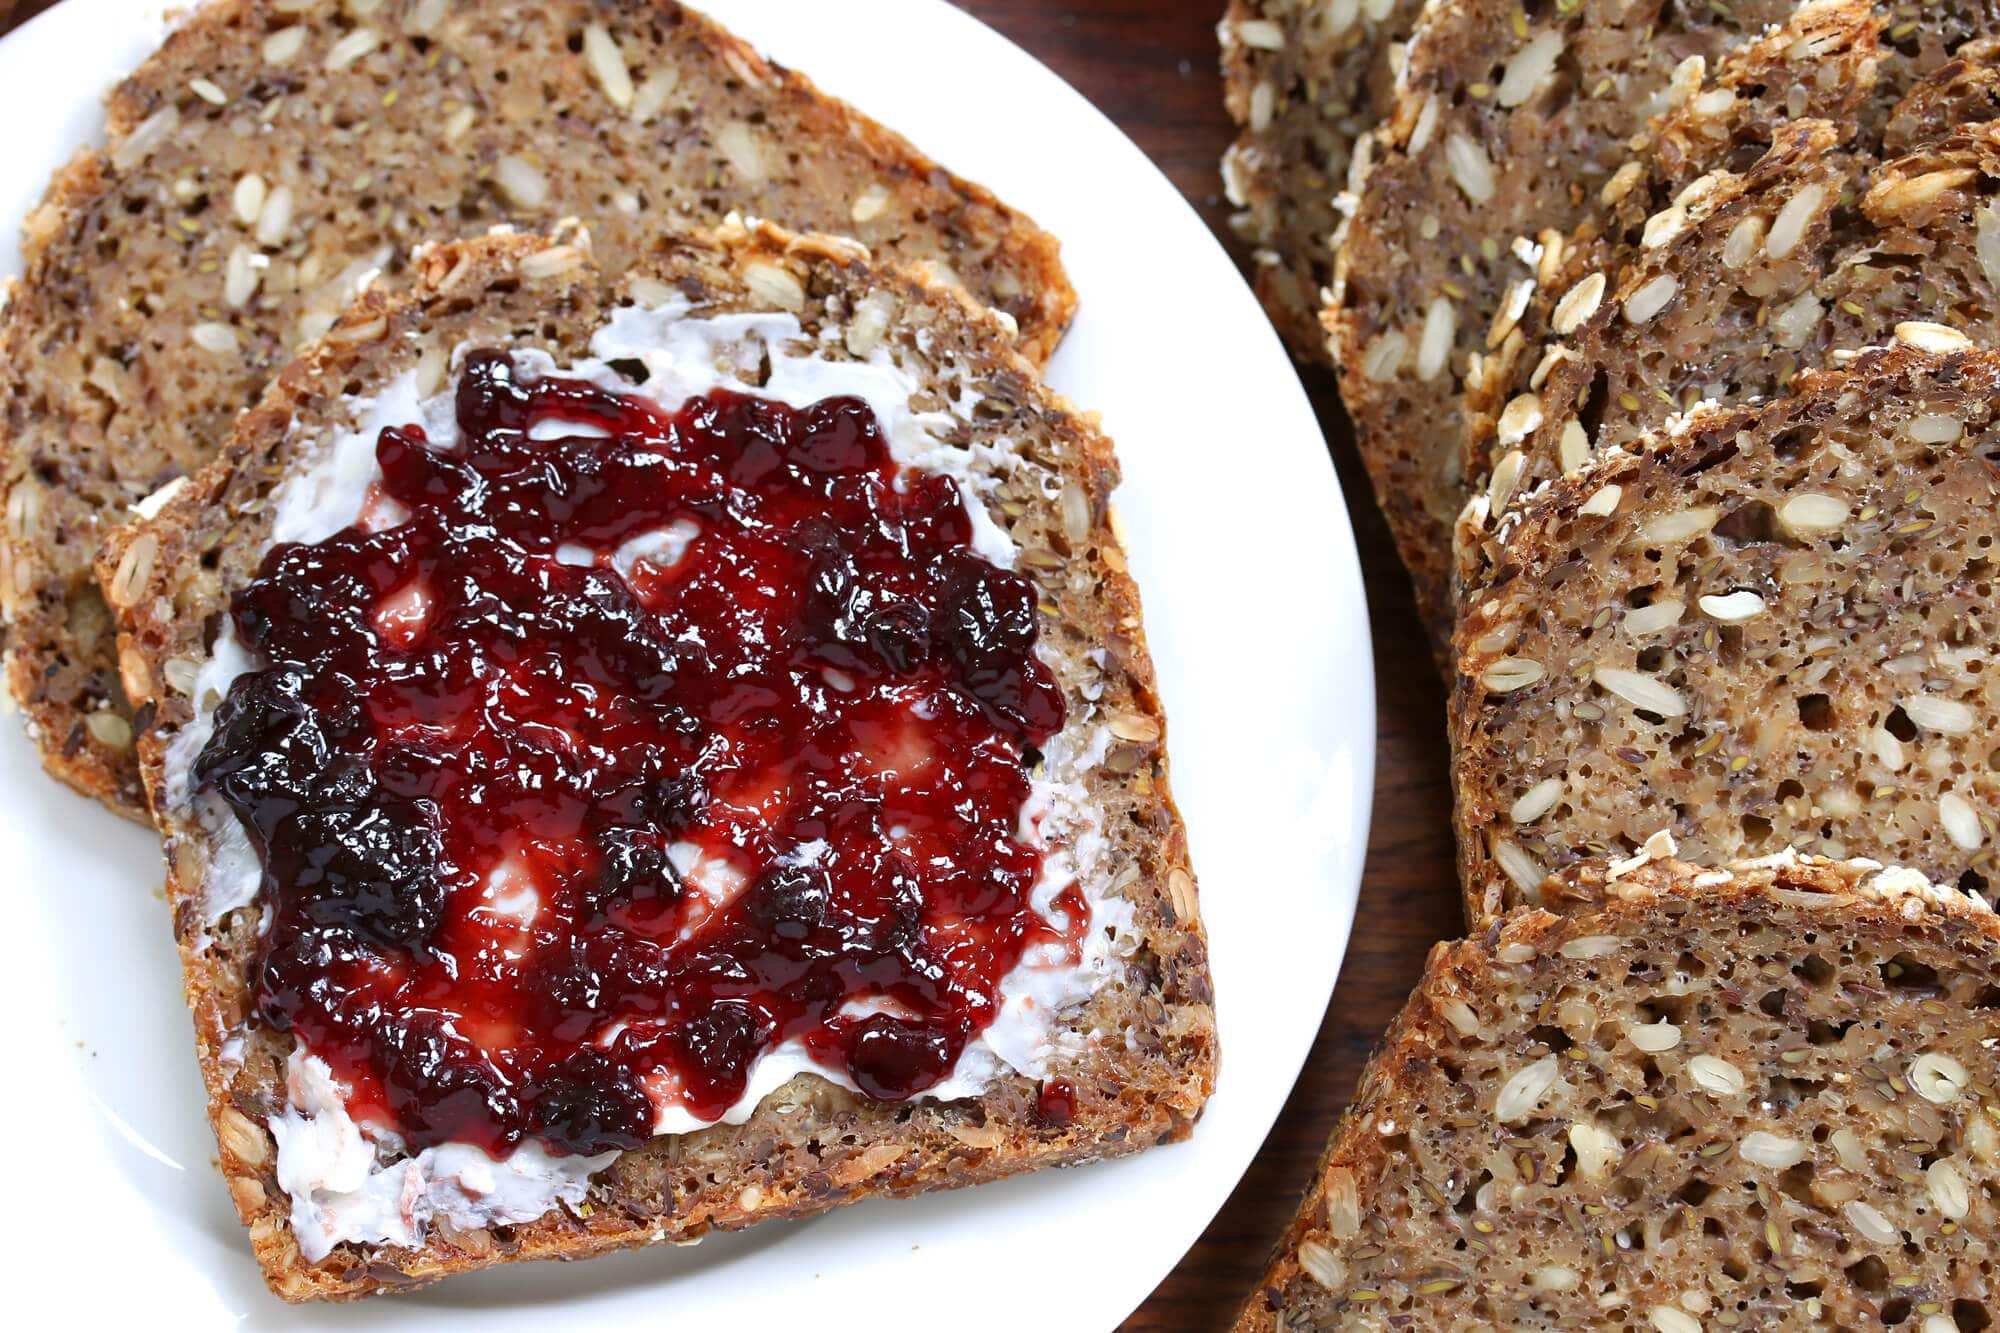 Vollkornbrot (German Whole Grain Seed Bread) - The Daring Gourmet